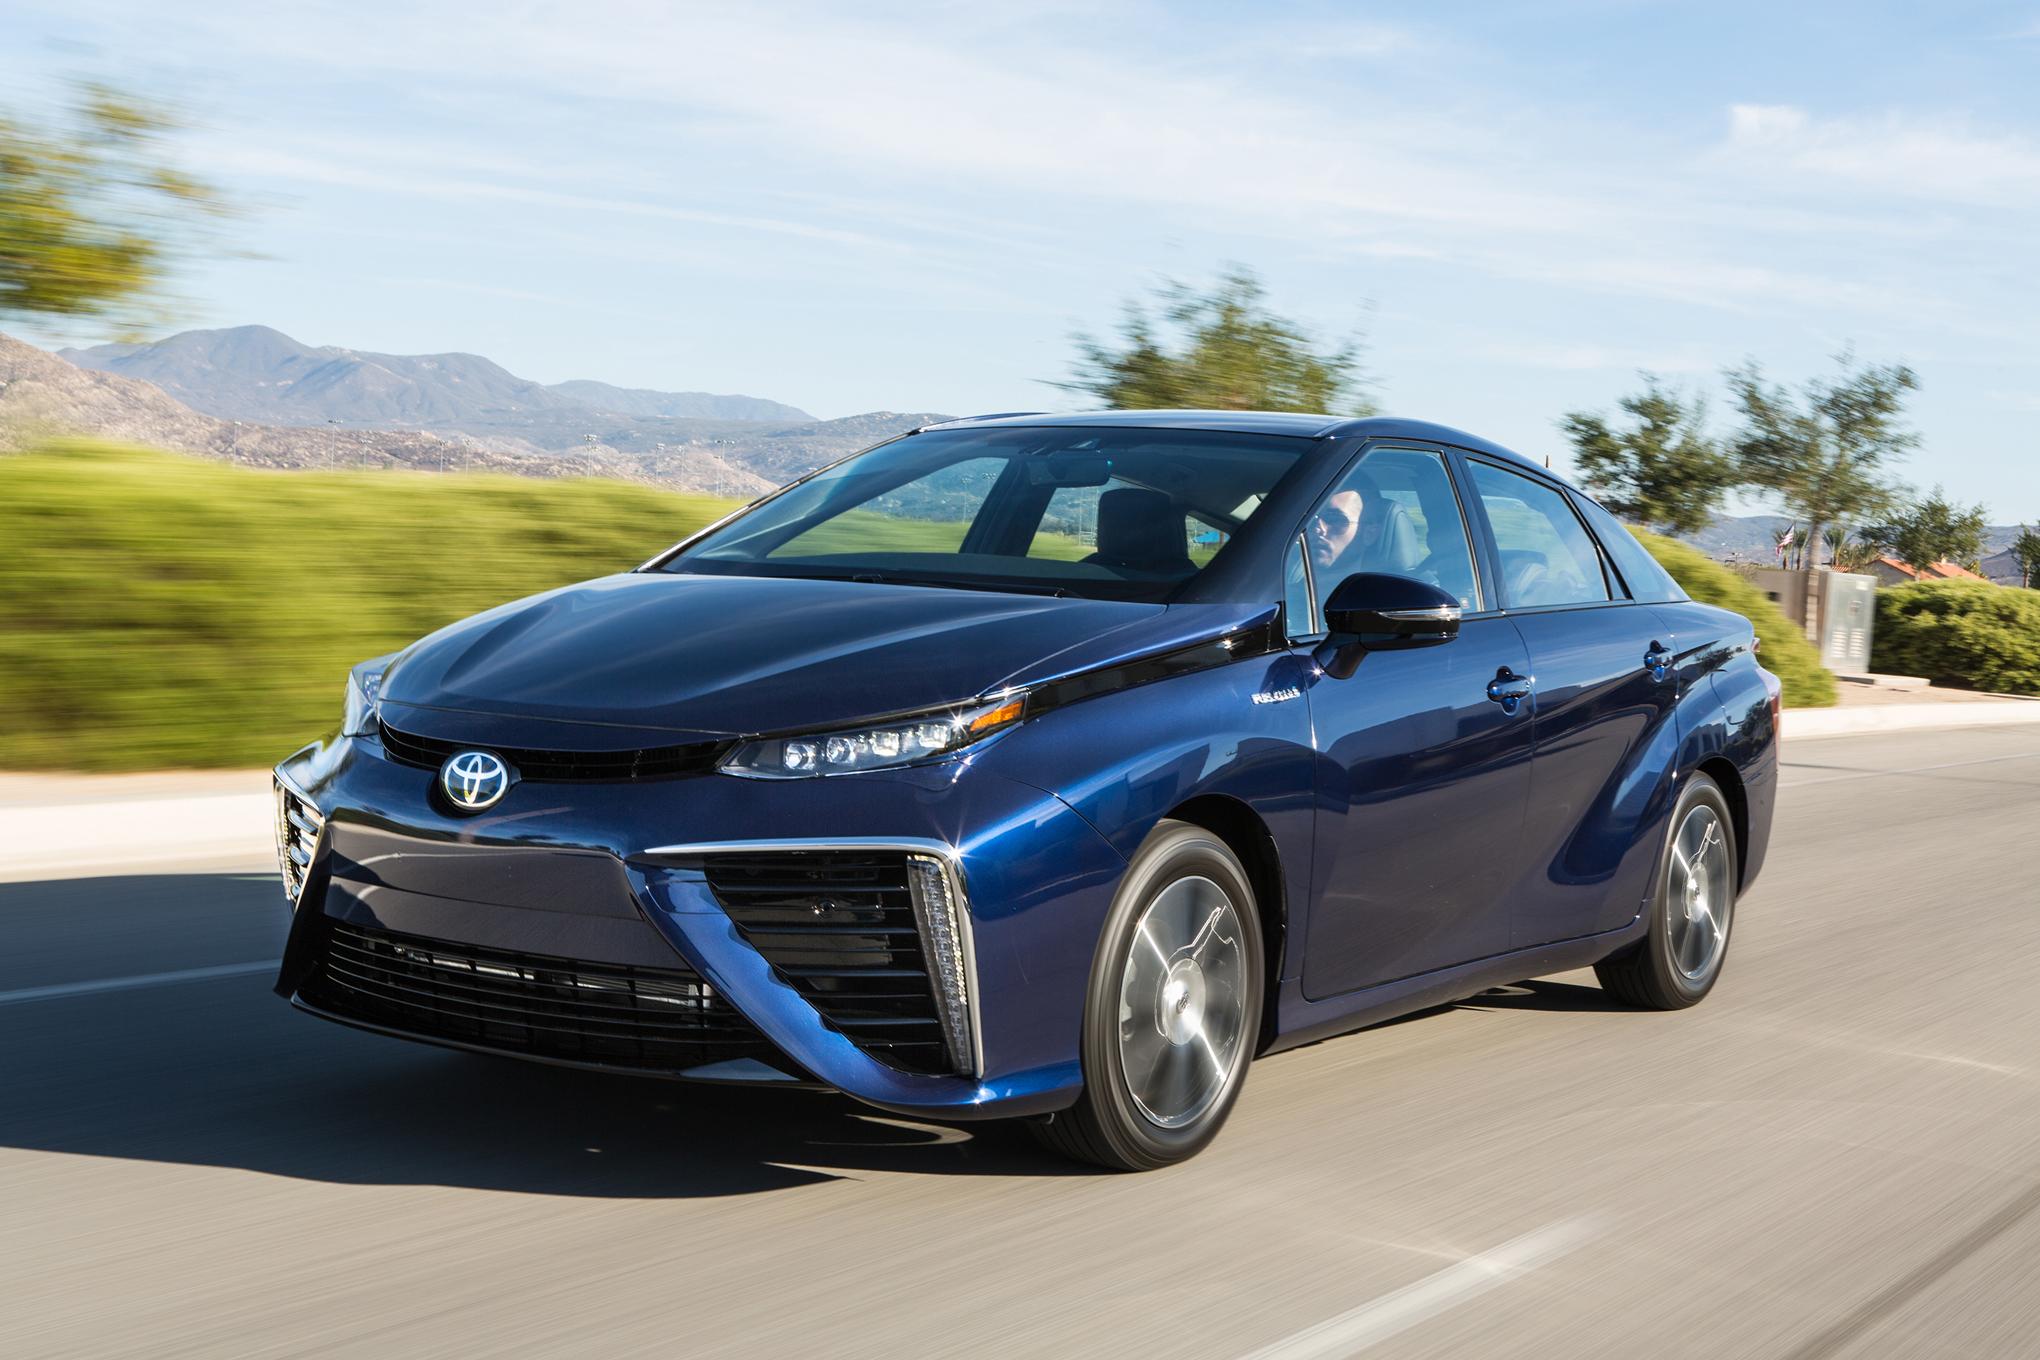 2016 Toyota Mirai Performance Test